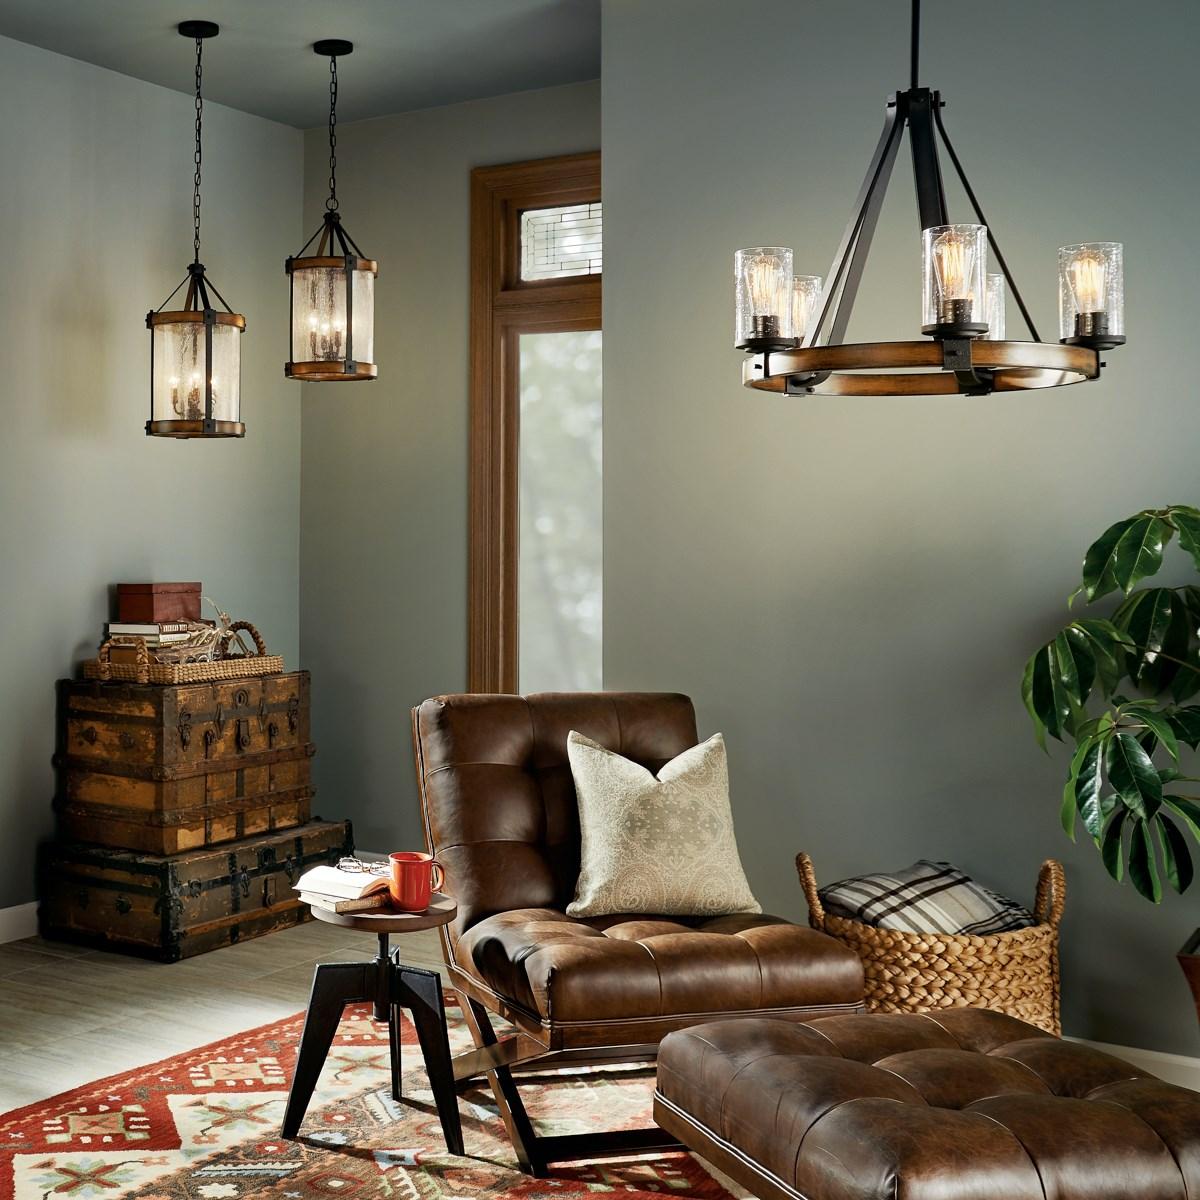 Barrington™ 5 Light Chandelier Distressed Black & Wood